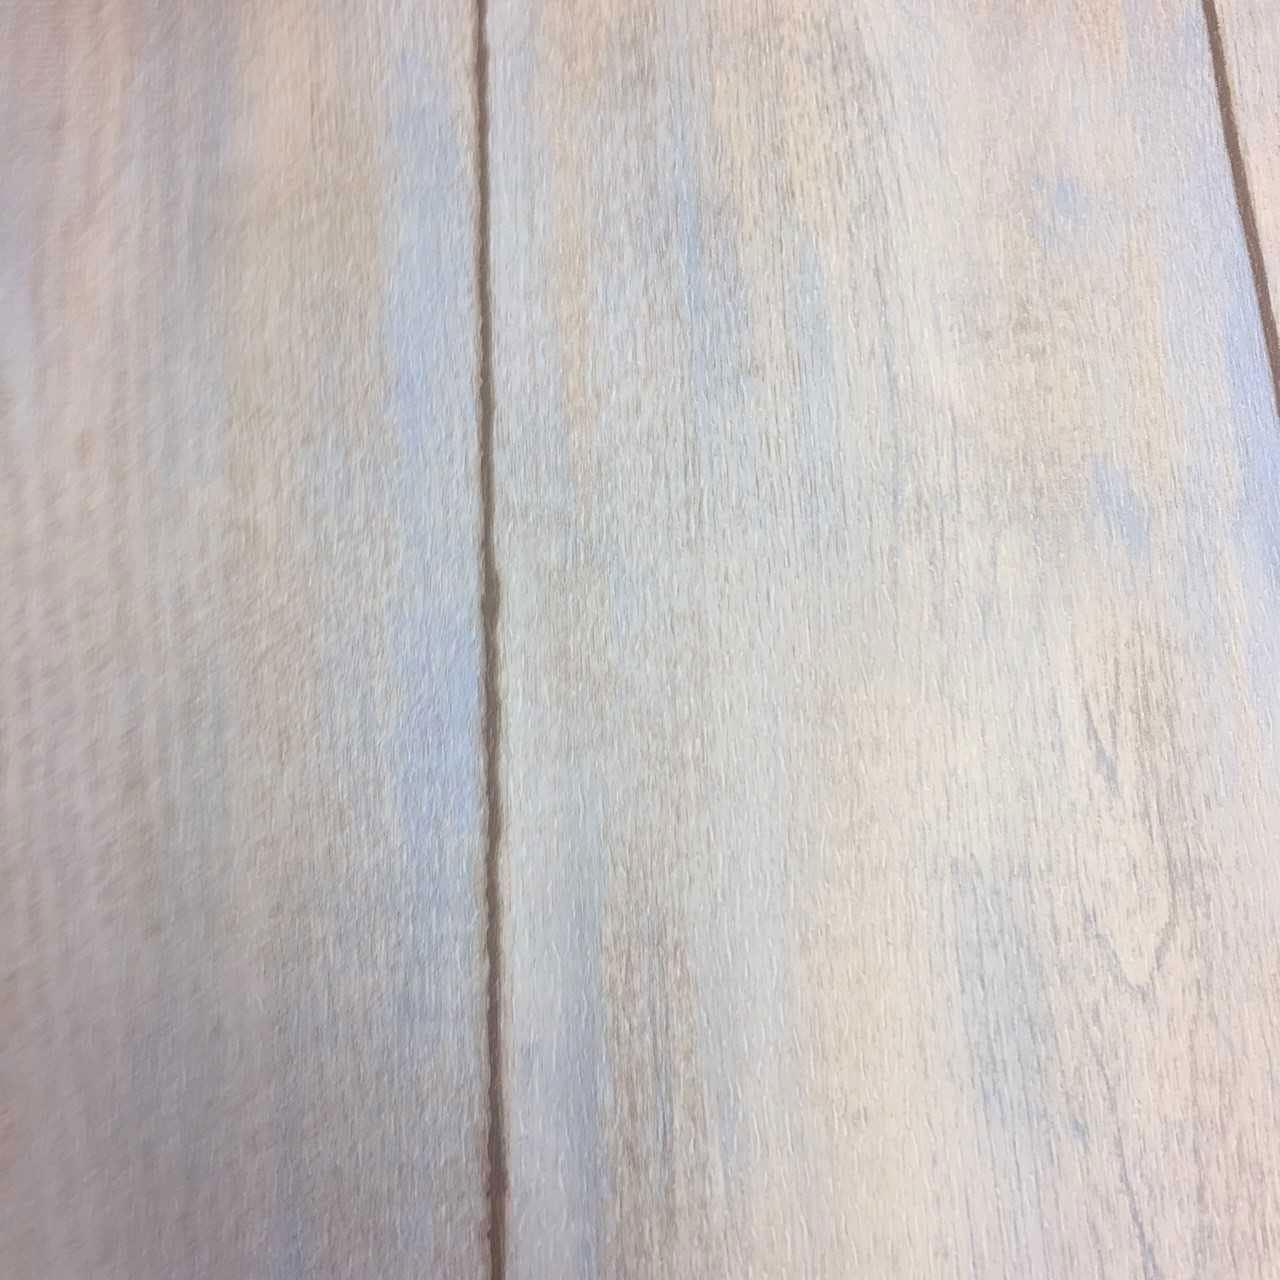 Wood-Effect-Wallpaper-Grains-Boards-Planks-Paste-The-Wall-Vinyl-Koziel-3-Colours thumbnail 4